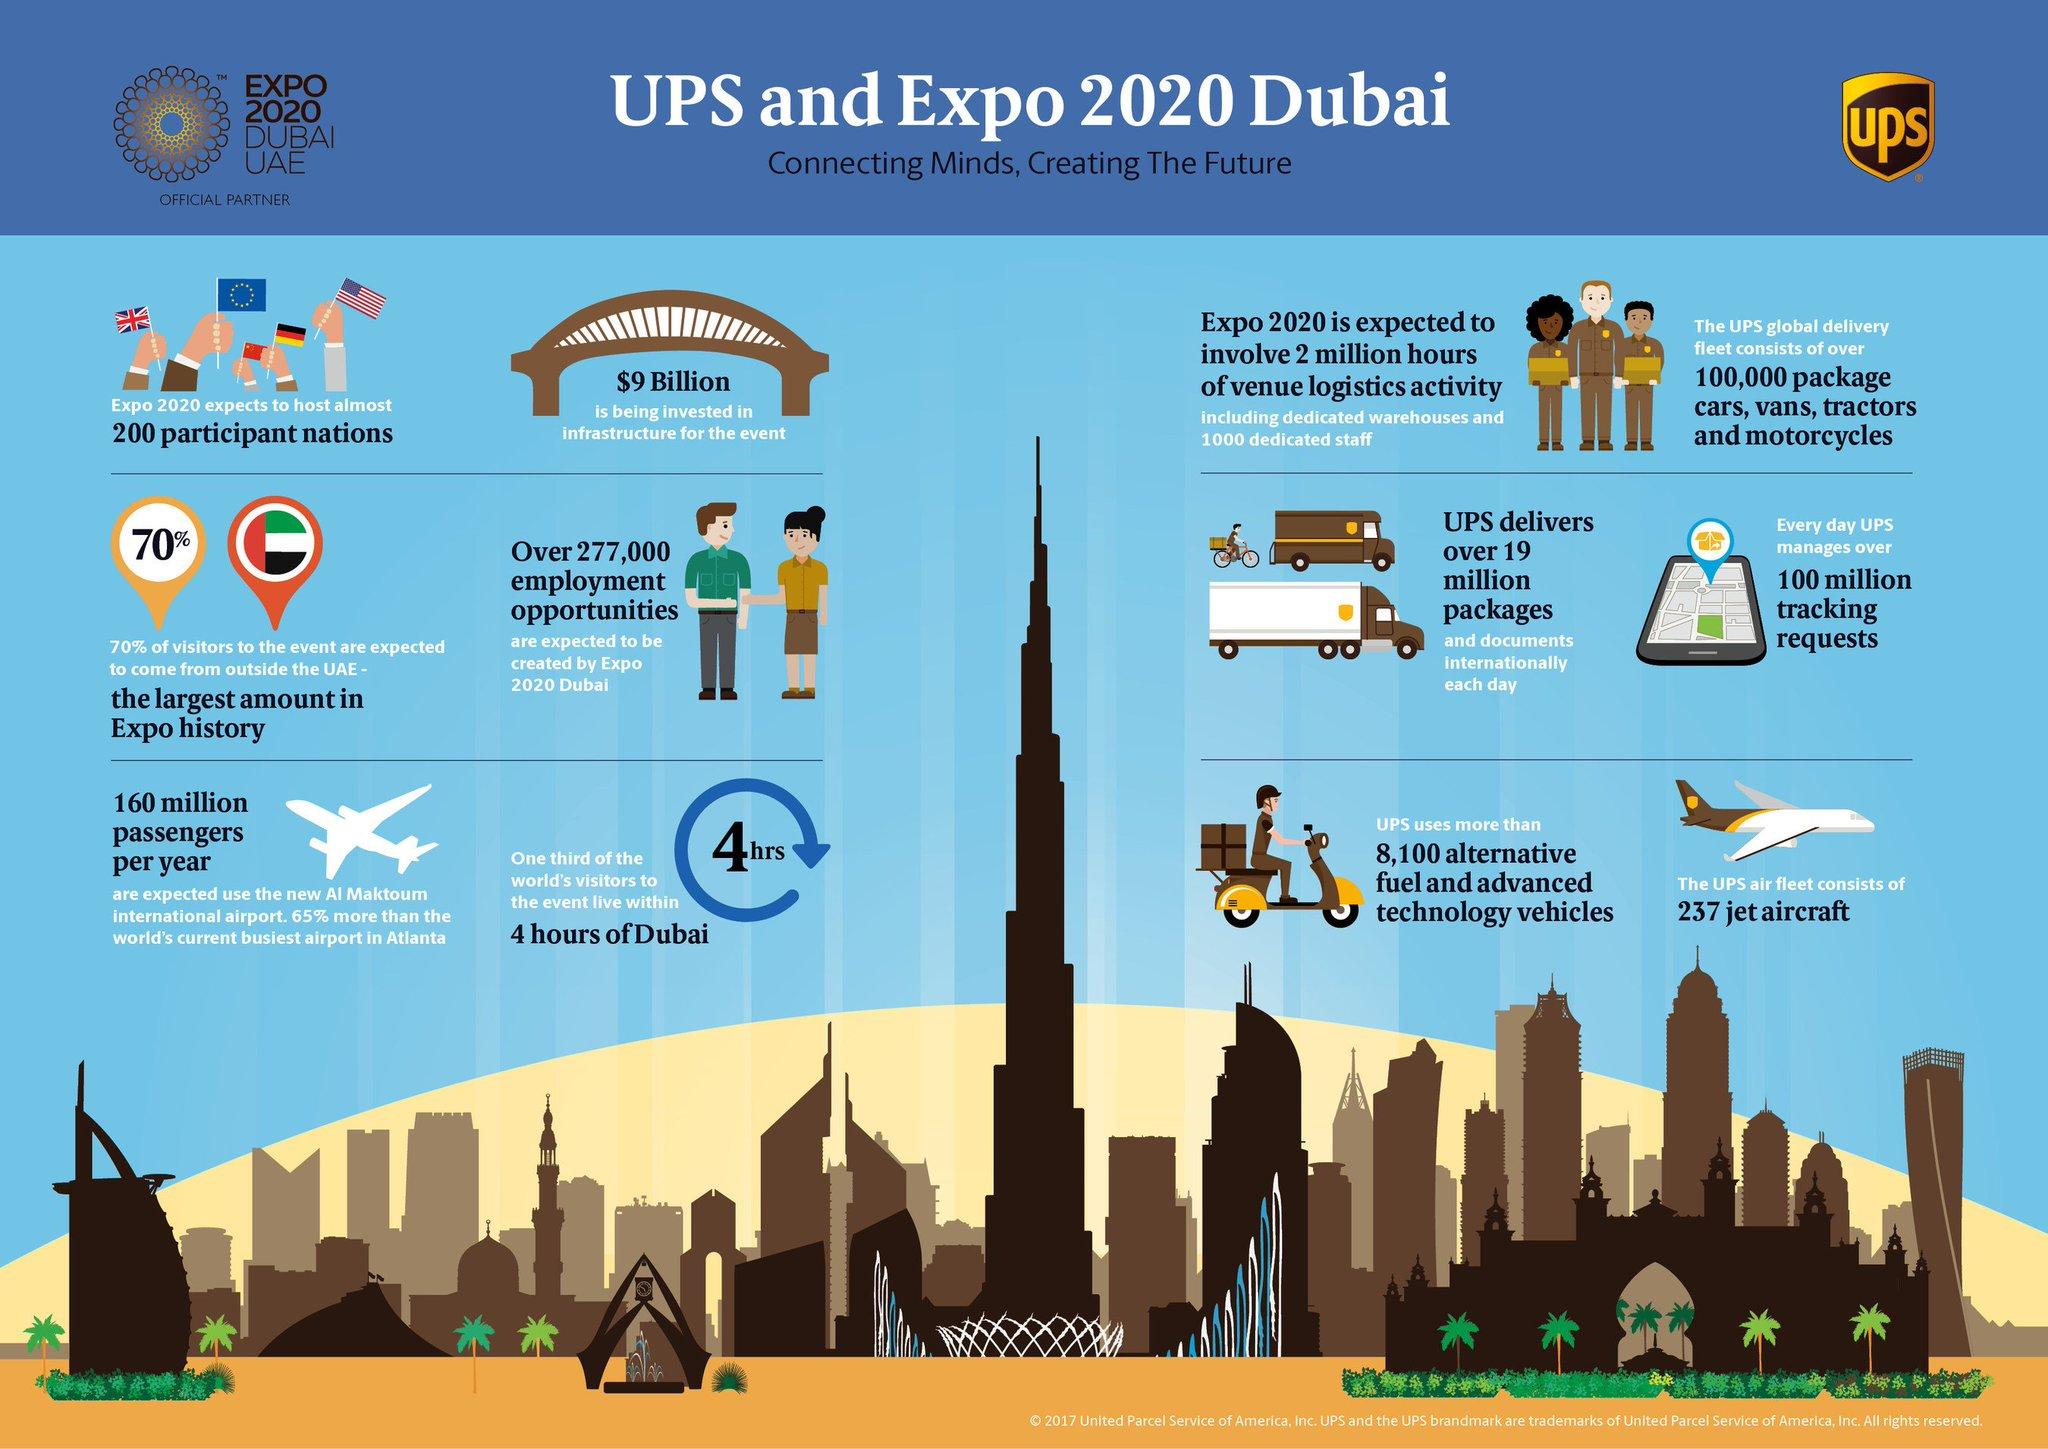 Ups Named Expo 2020 Official Logistics Partner Khaleej Times